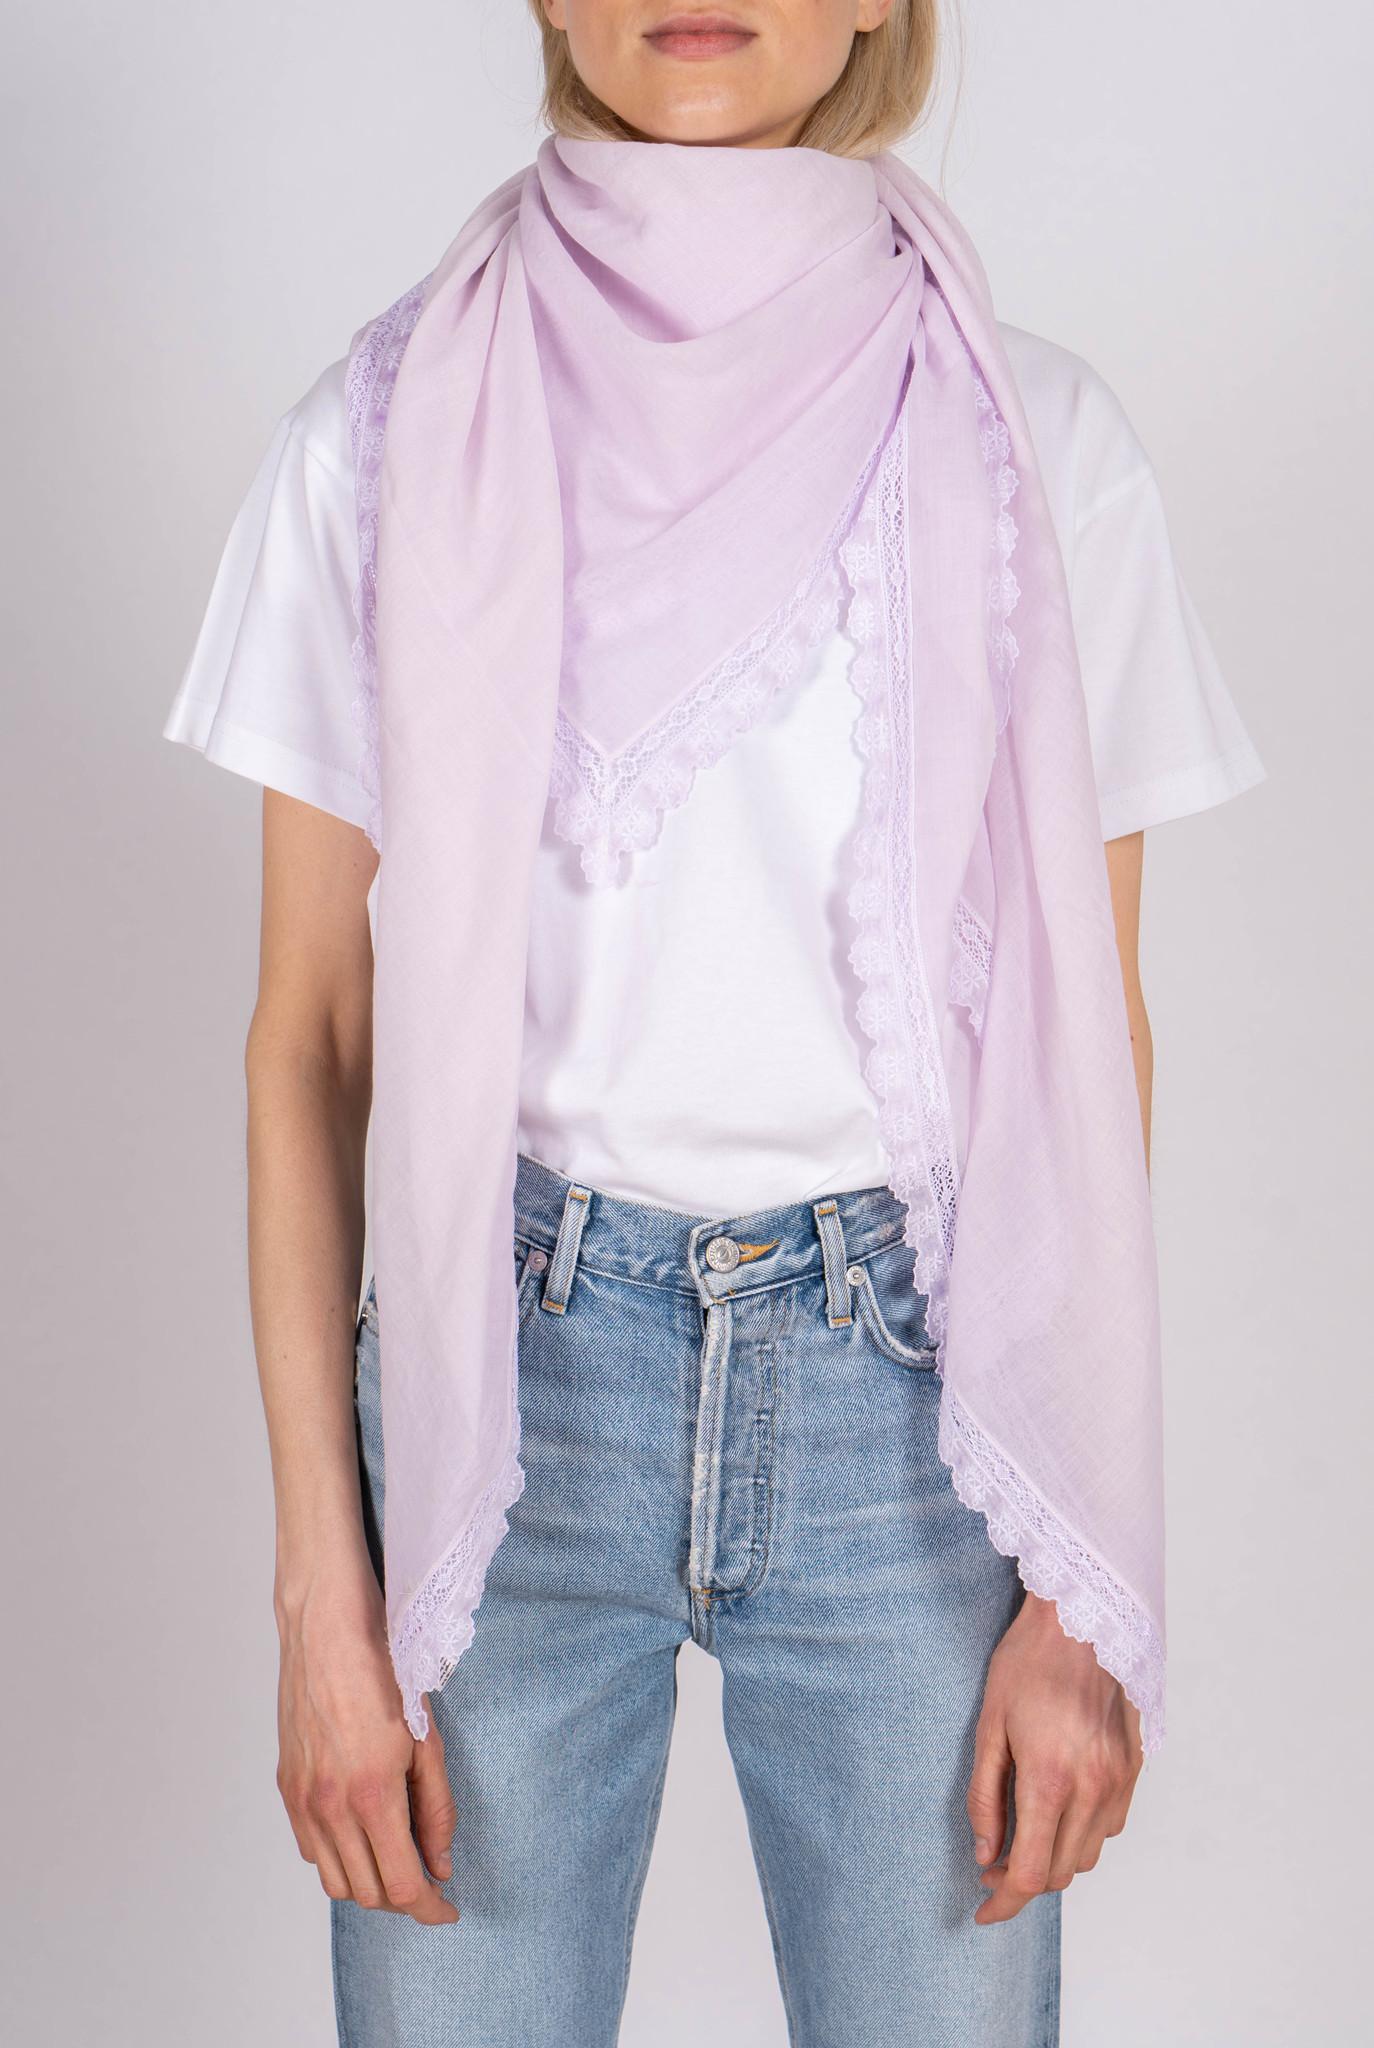 Karina scarf lilac embroidery